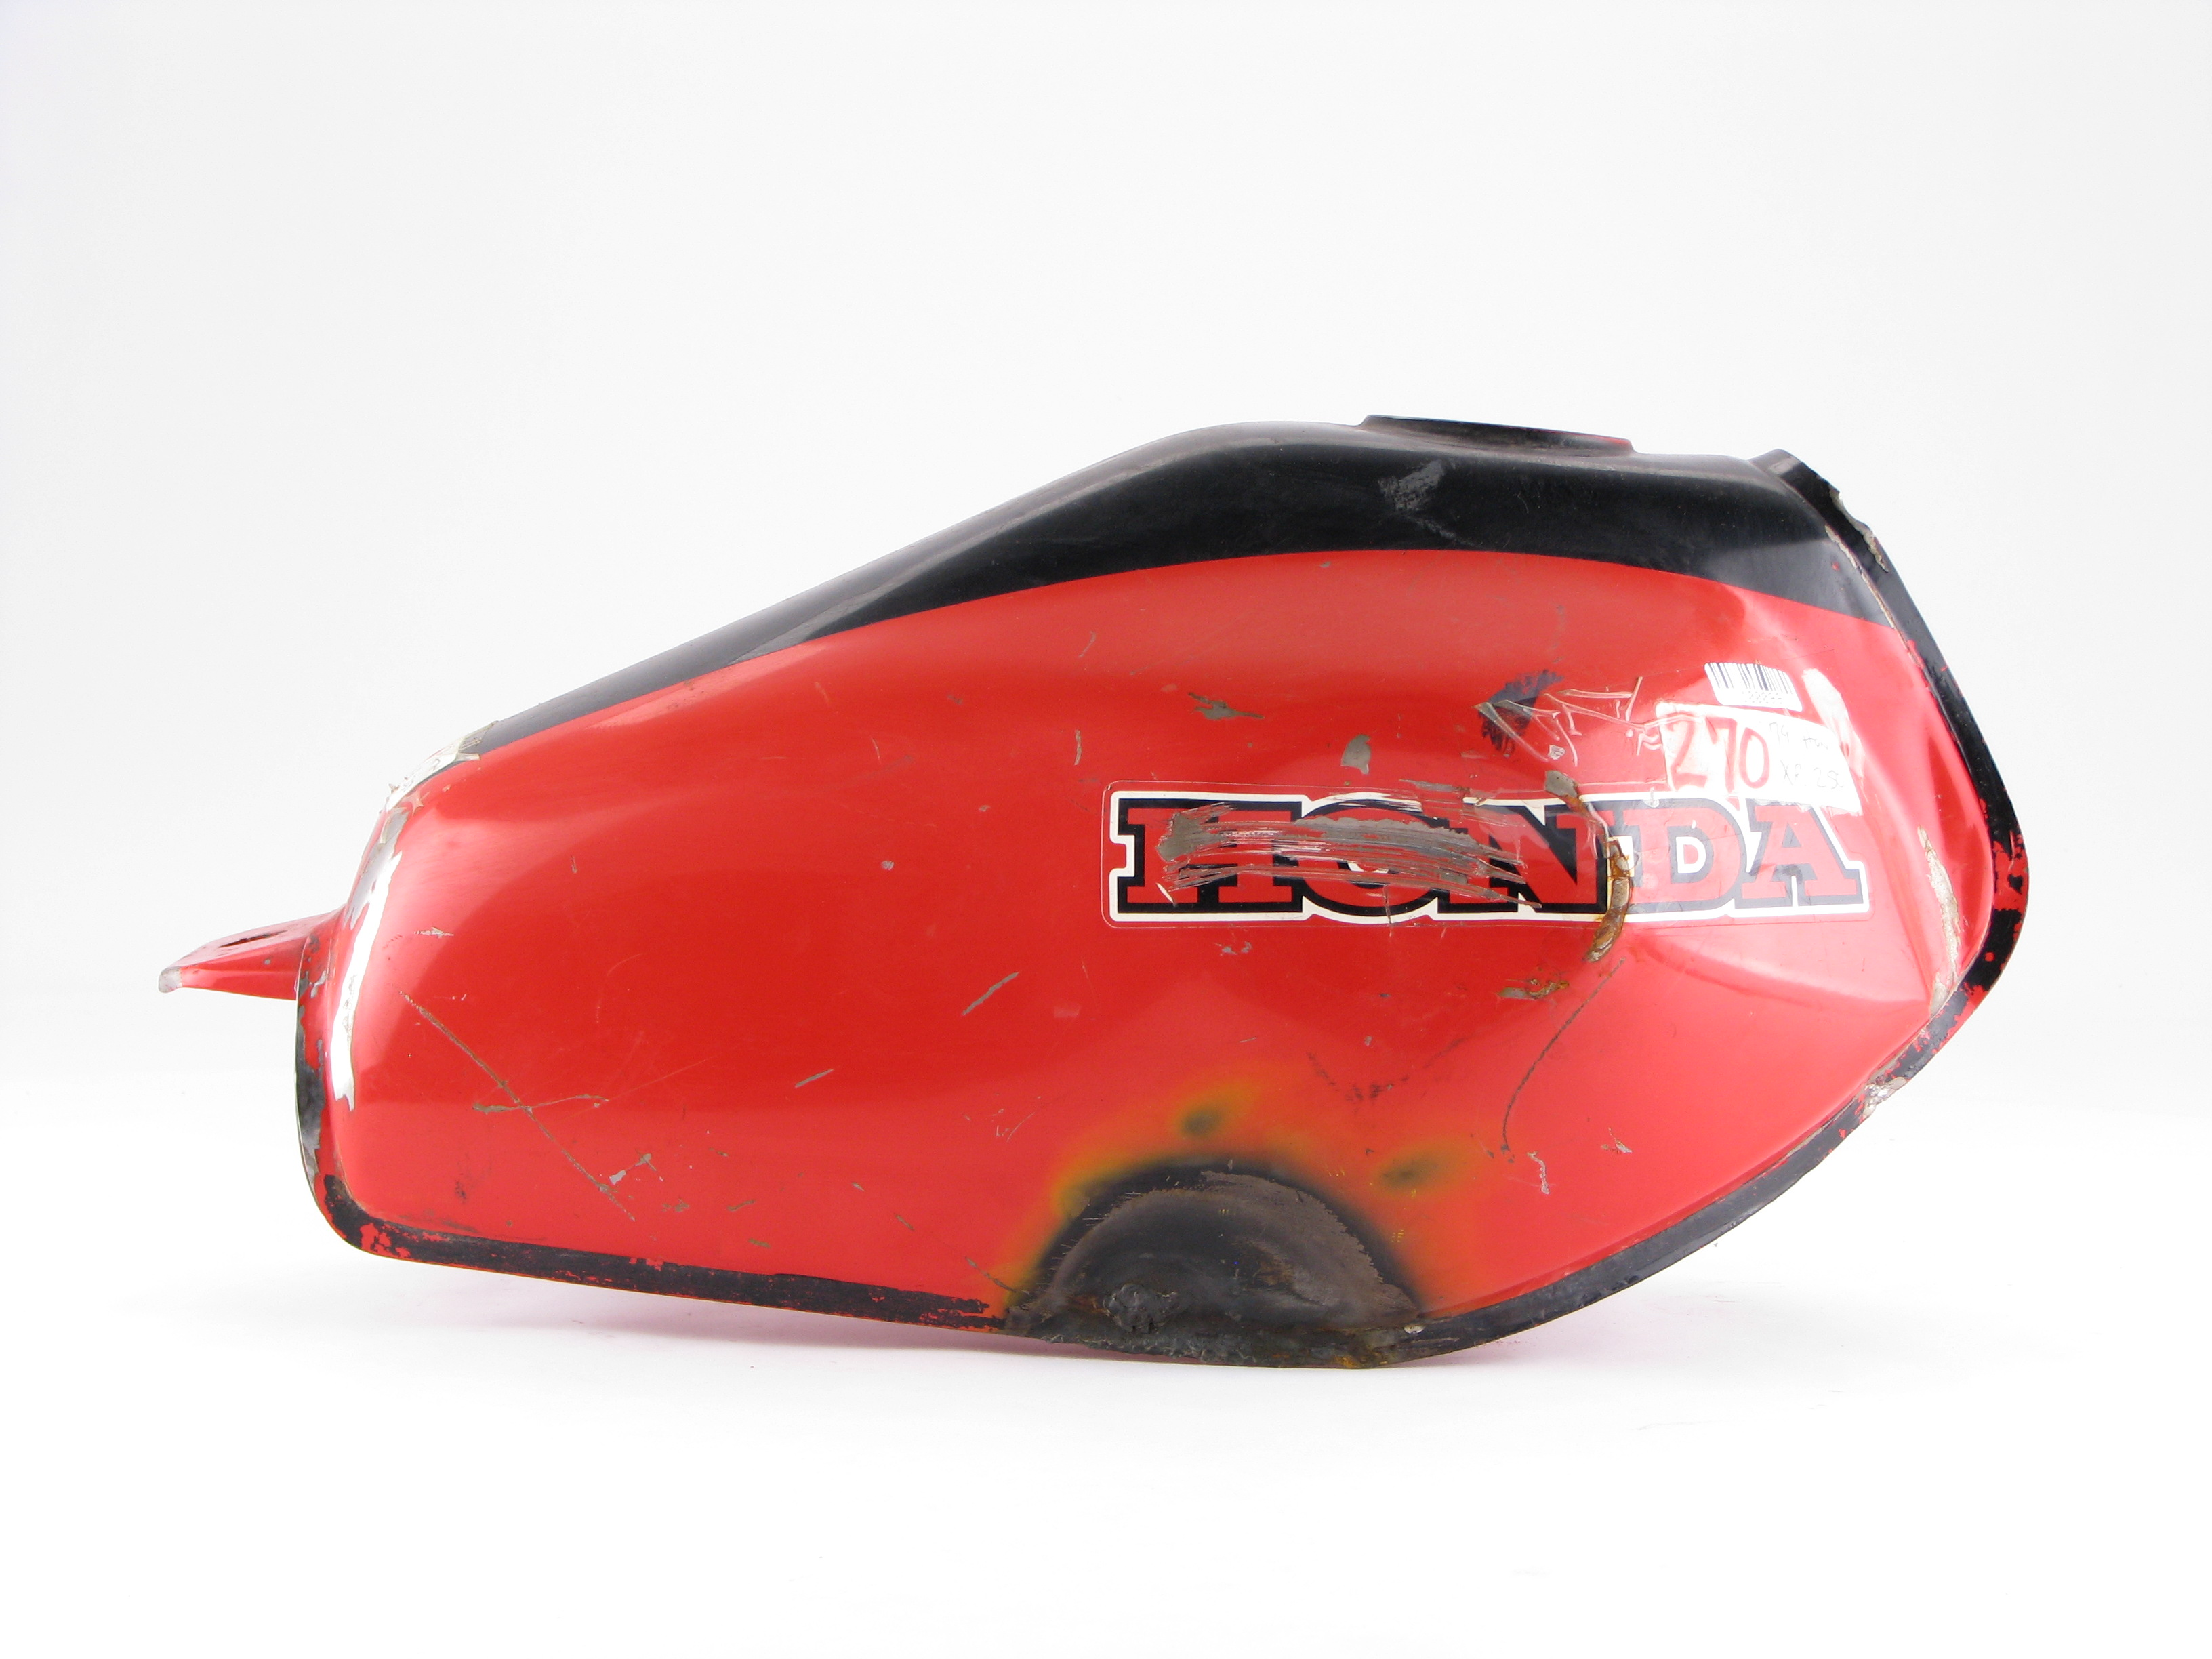 79 1979 Honda XR250 XR 250 Gas Fuel Petrol Tank Fair Used 100099 | eBay